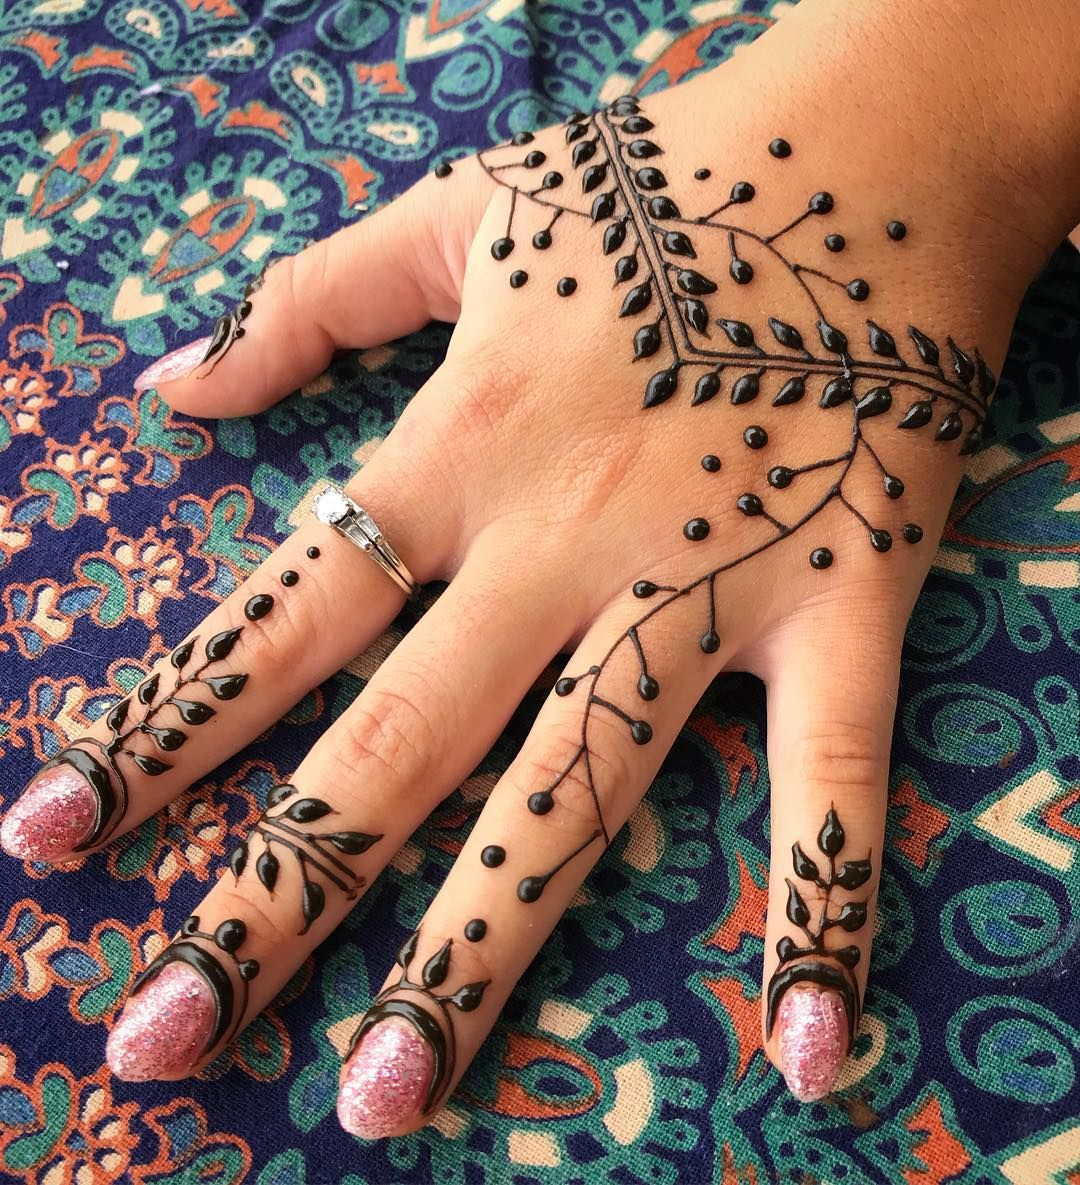 Amazon.com: henna tattoo kit